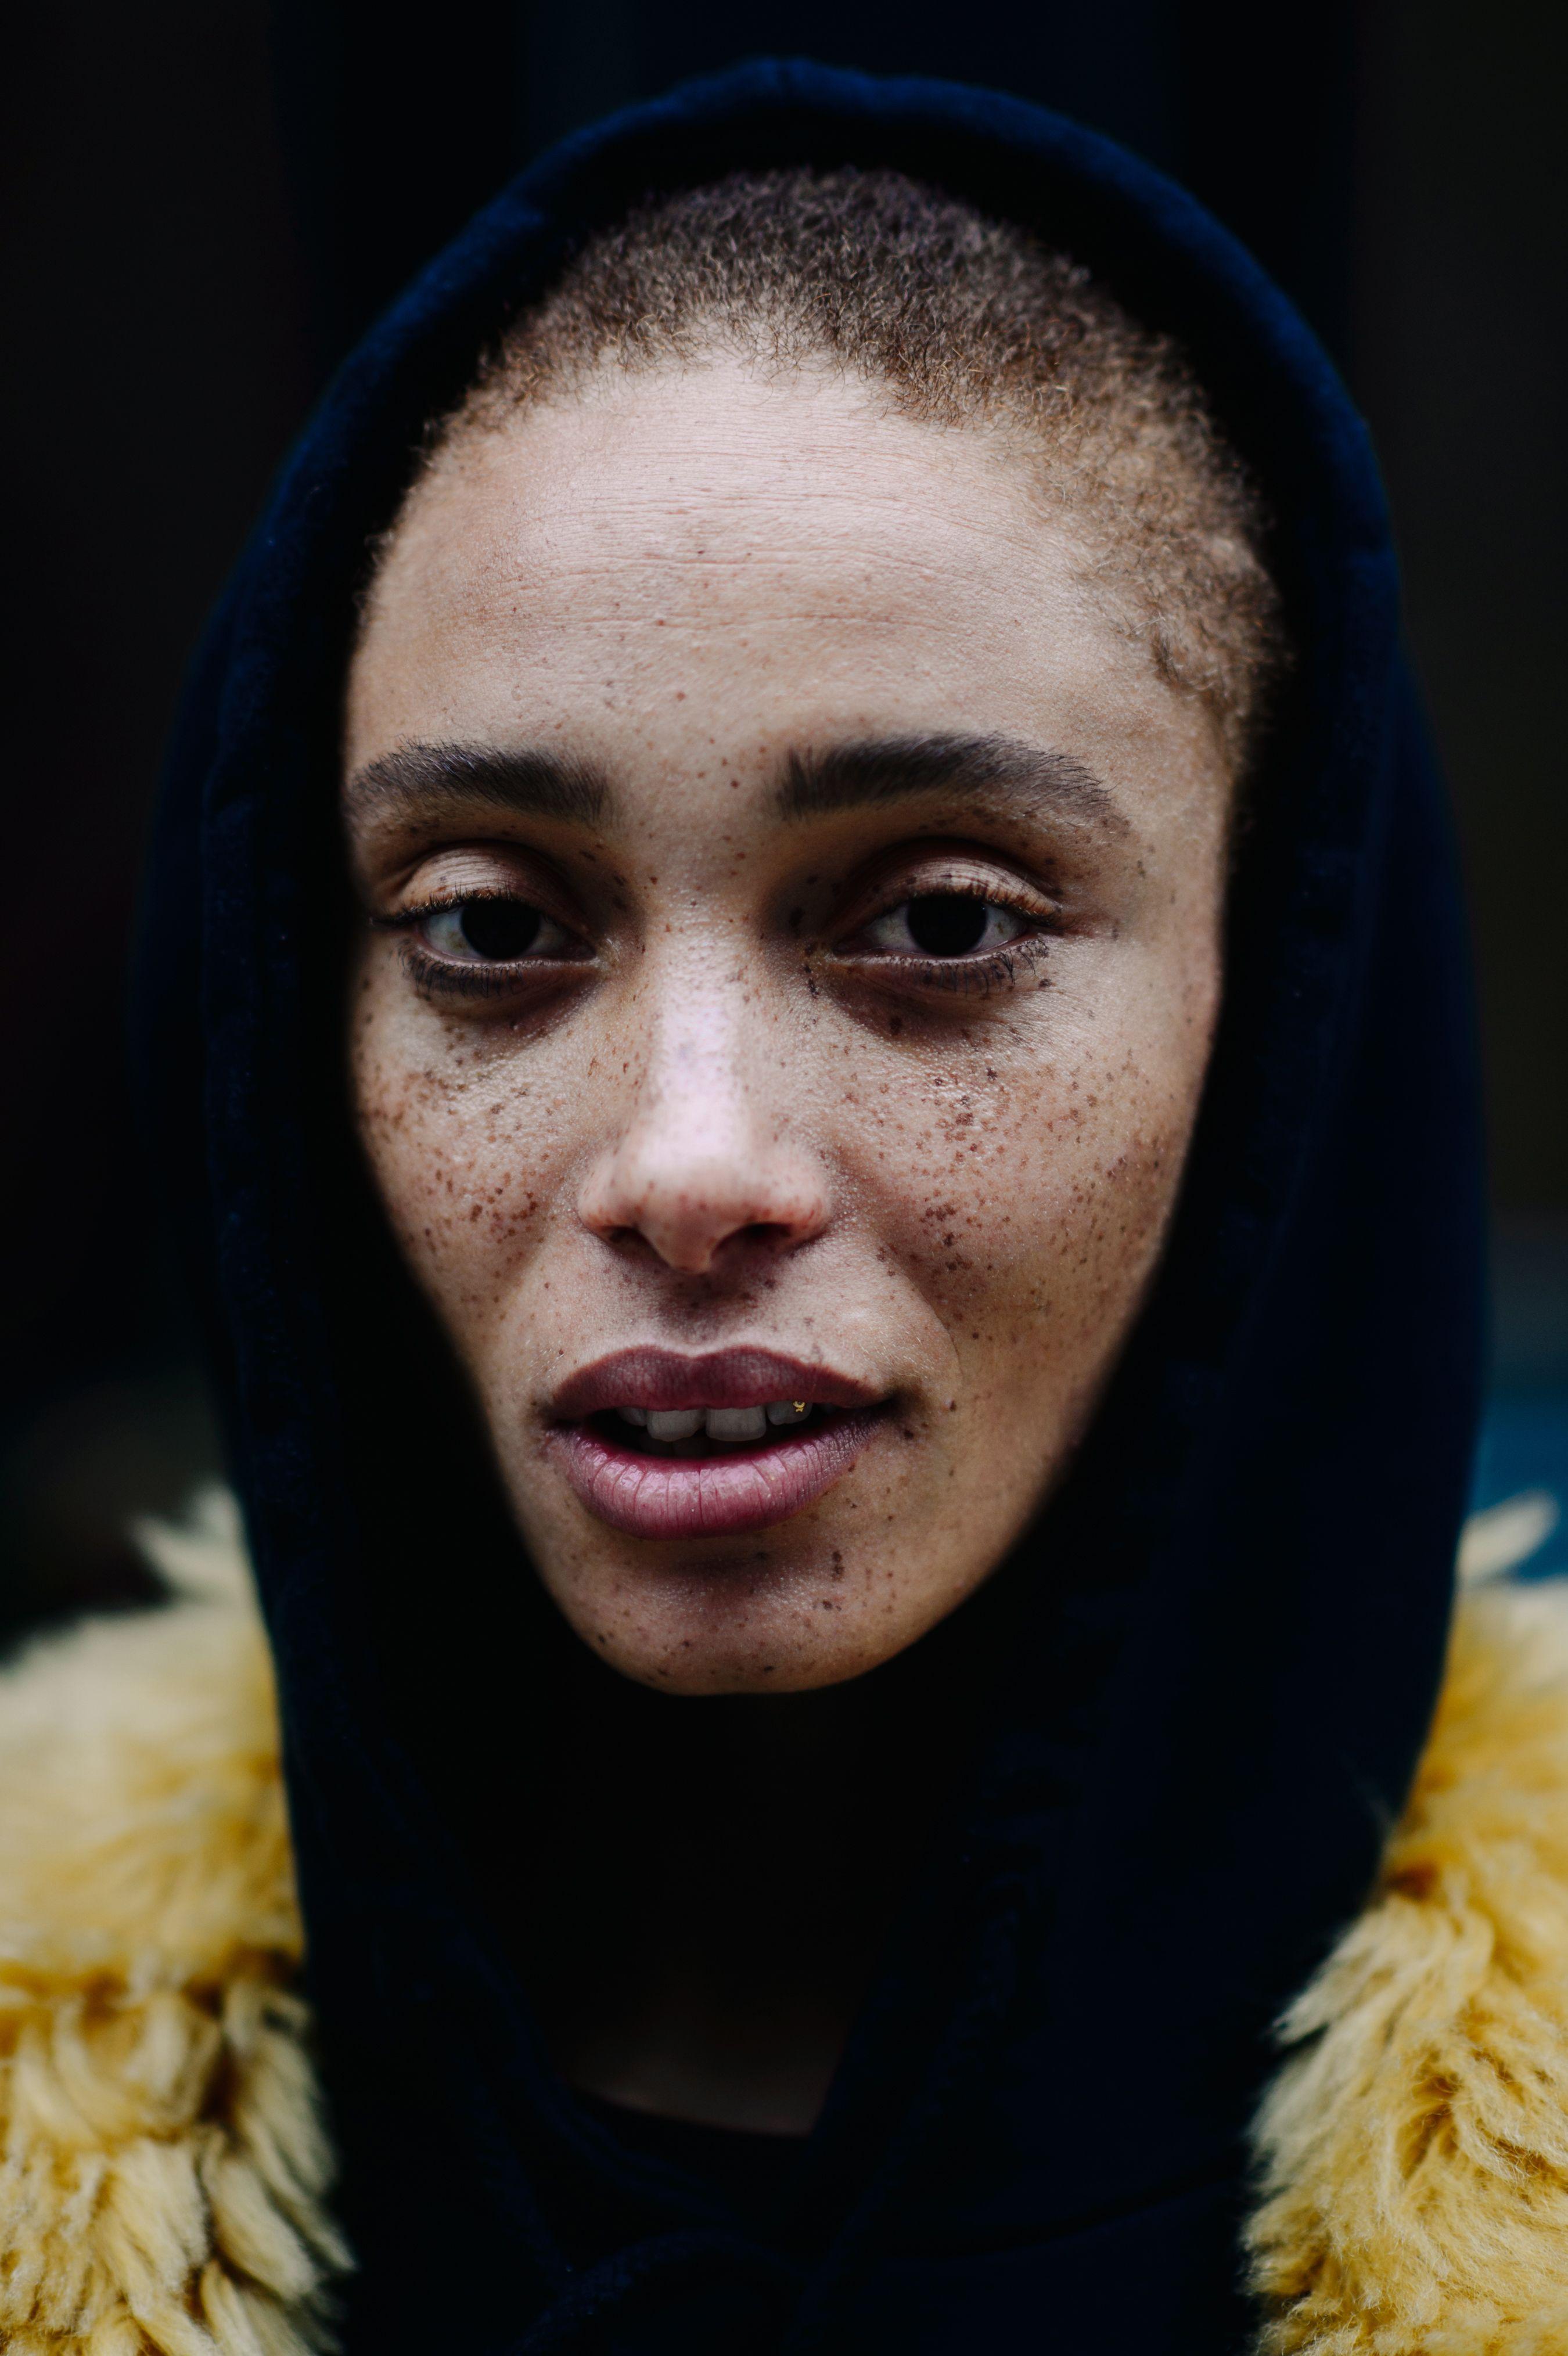 Le 21ème / Adwoa Aboah New York City // Fashion,